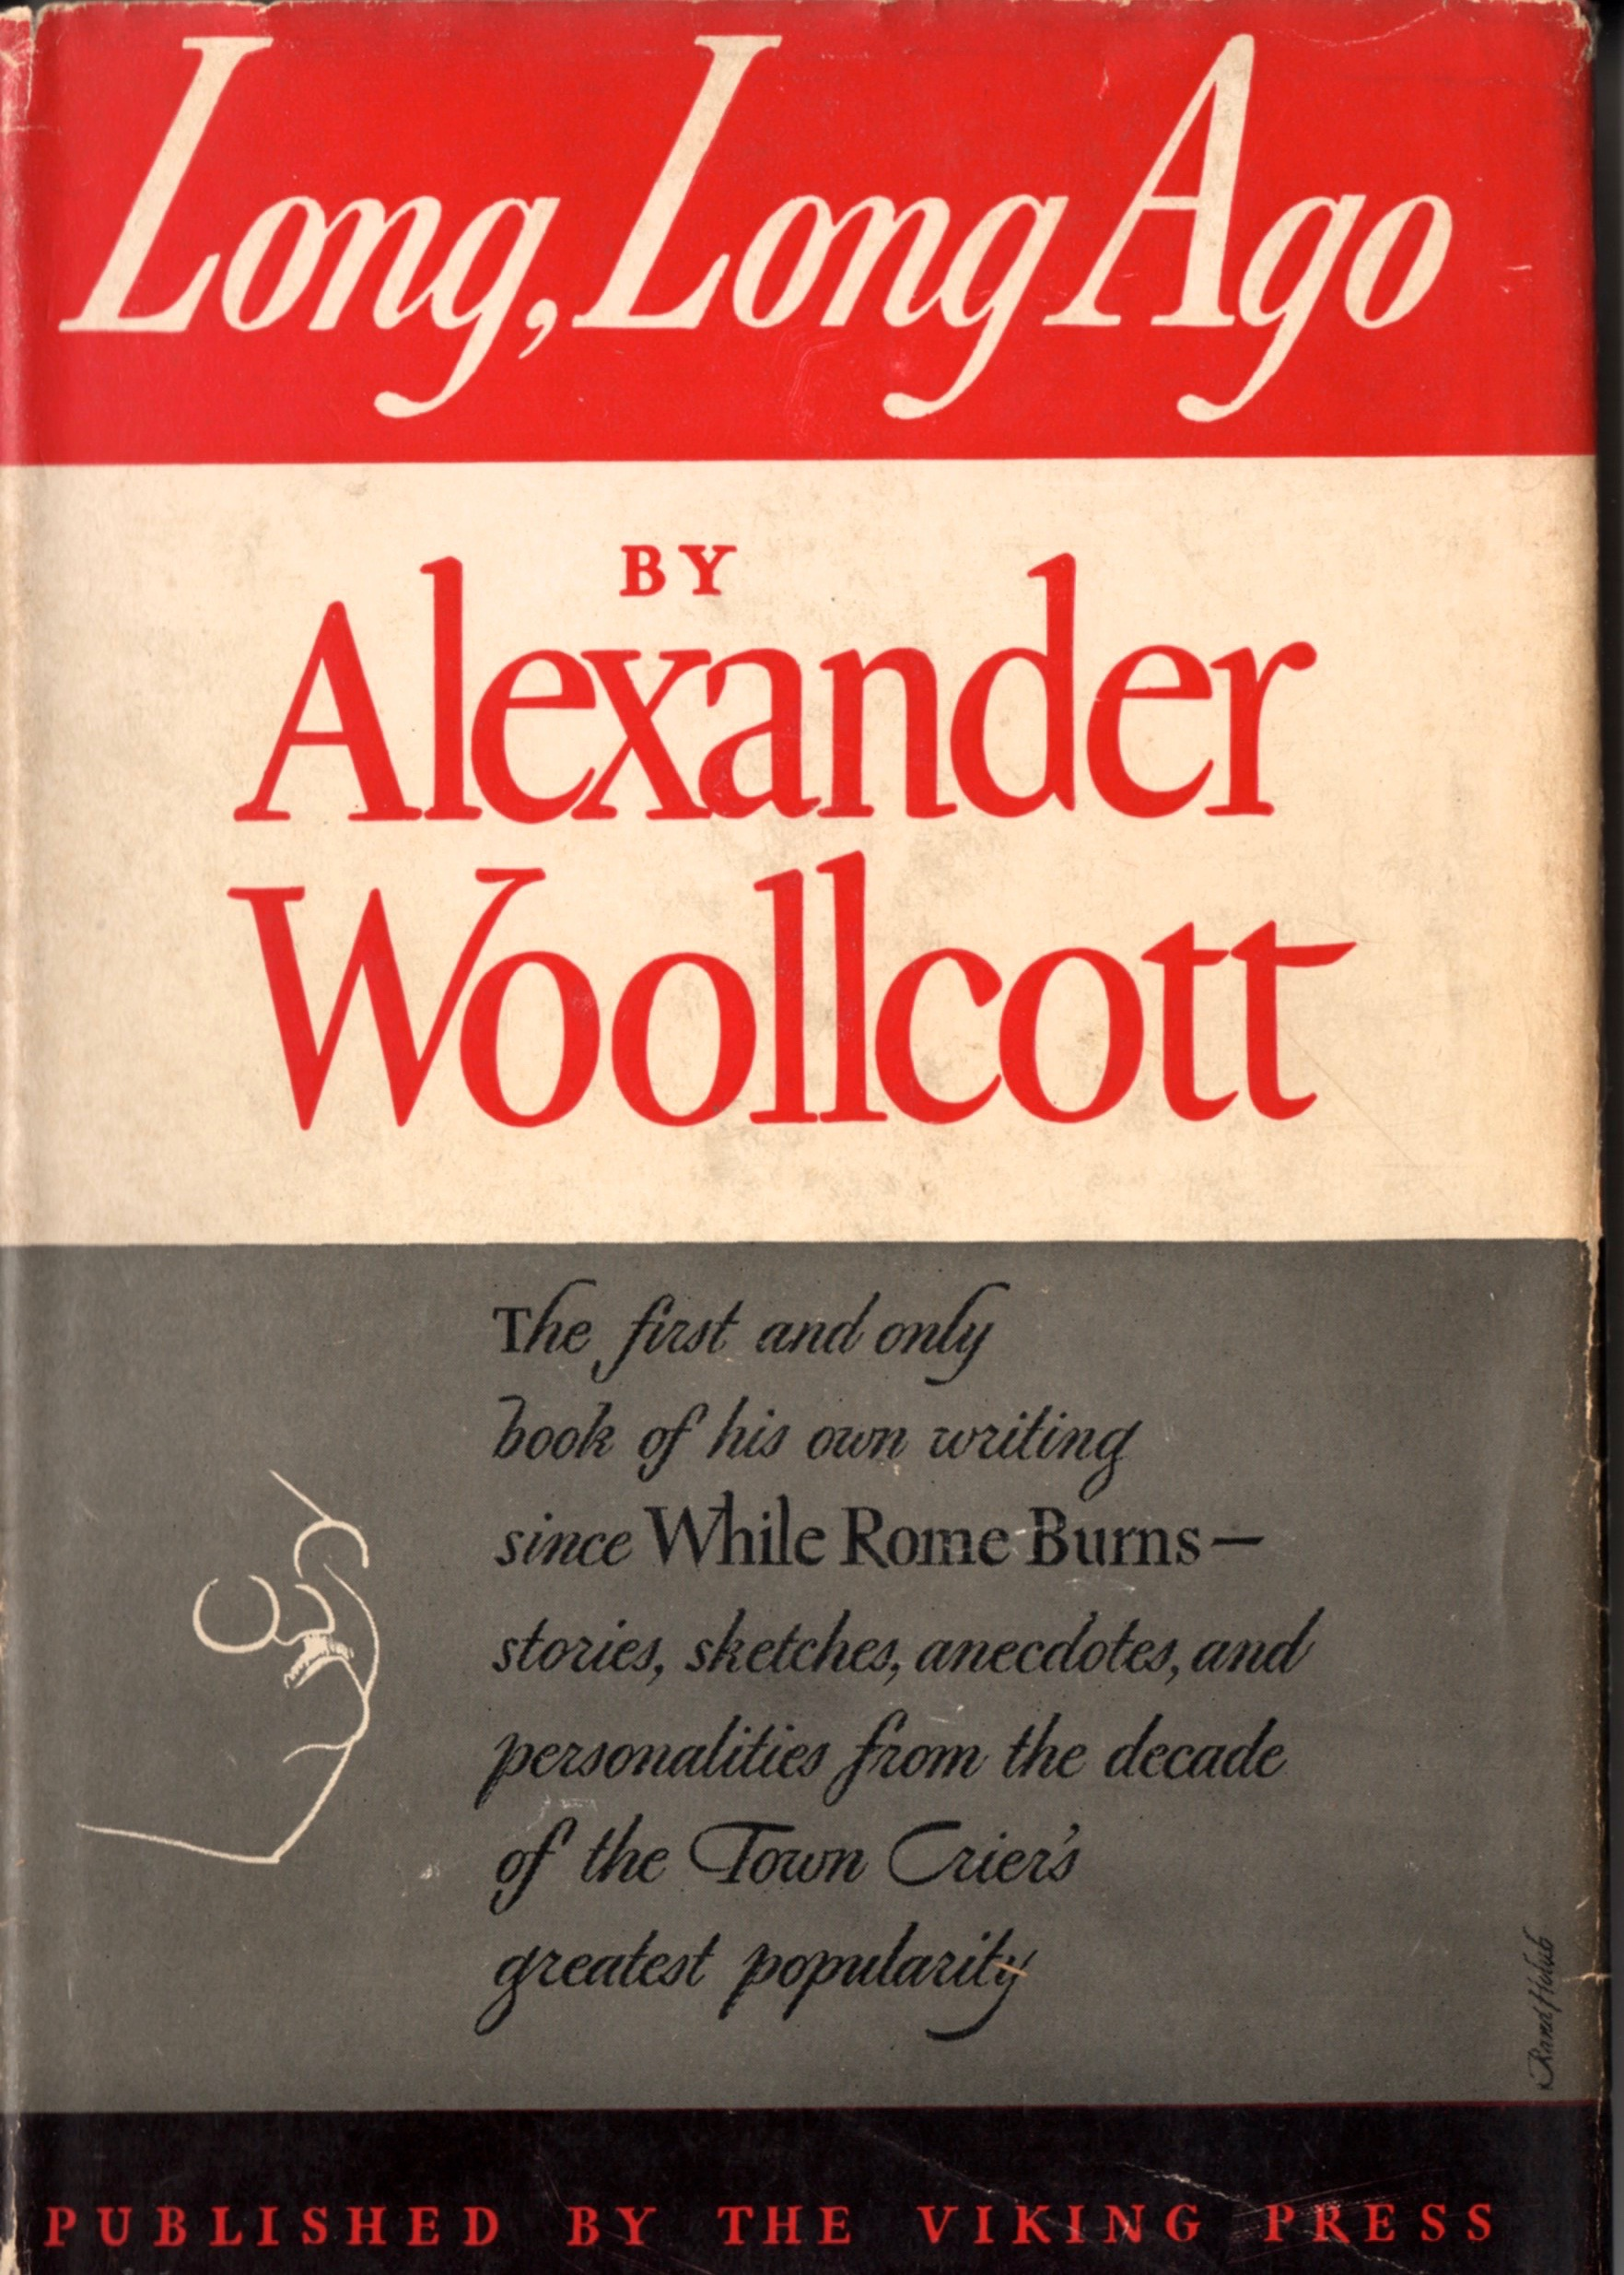 "Woollcott's anthology,  Long, Long Ago  reprints his ""Shouts and Murmurs"" column from  The New Yorker  on the Baker Street Irregulars 1934 dinner."